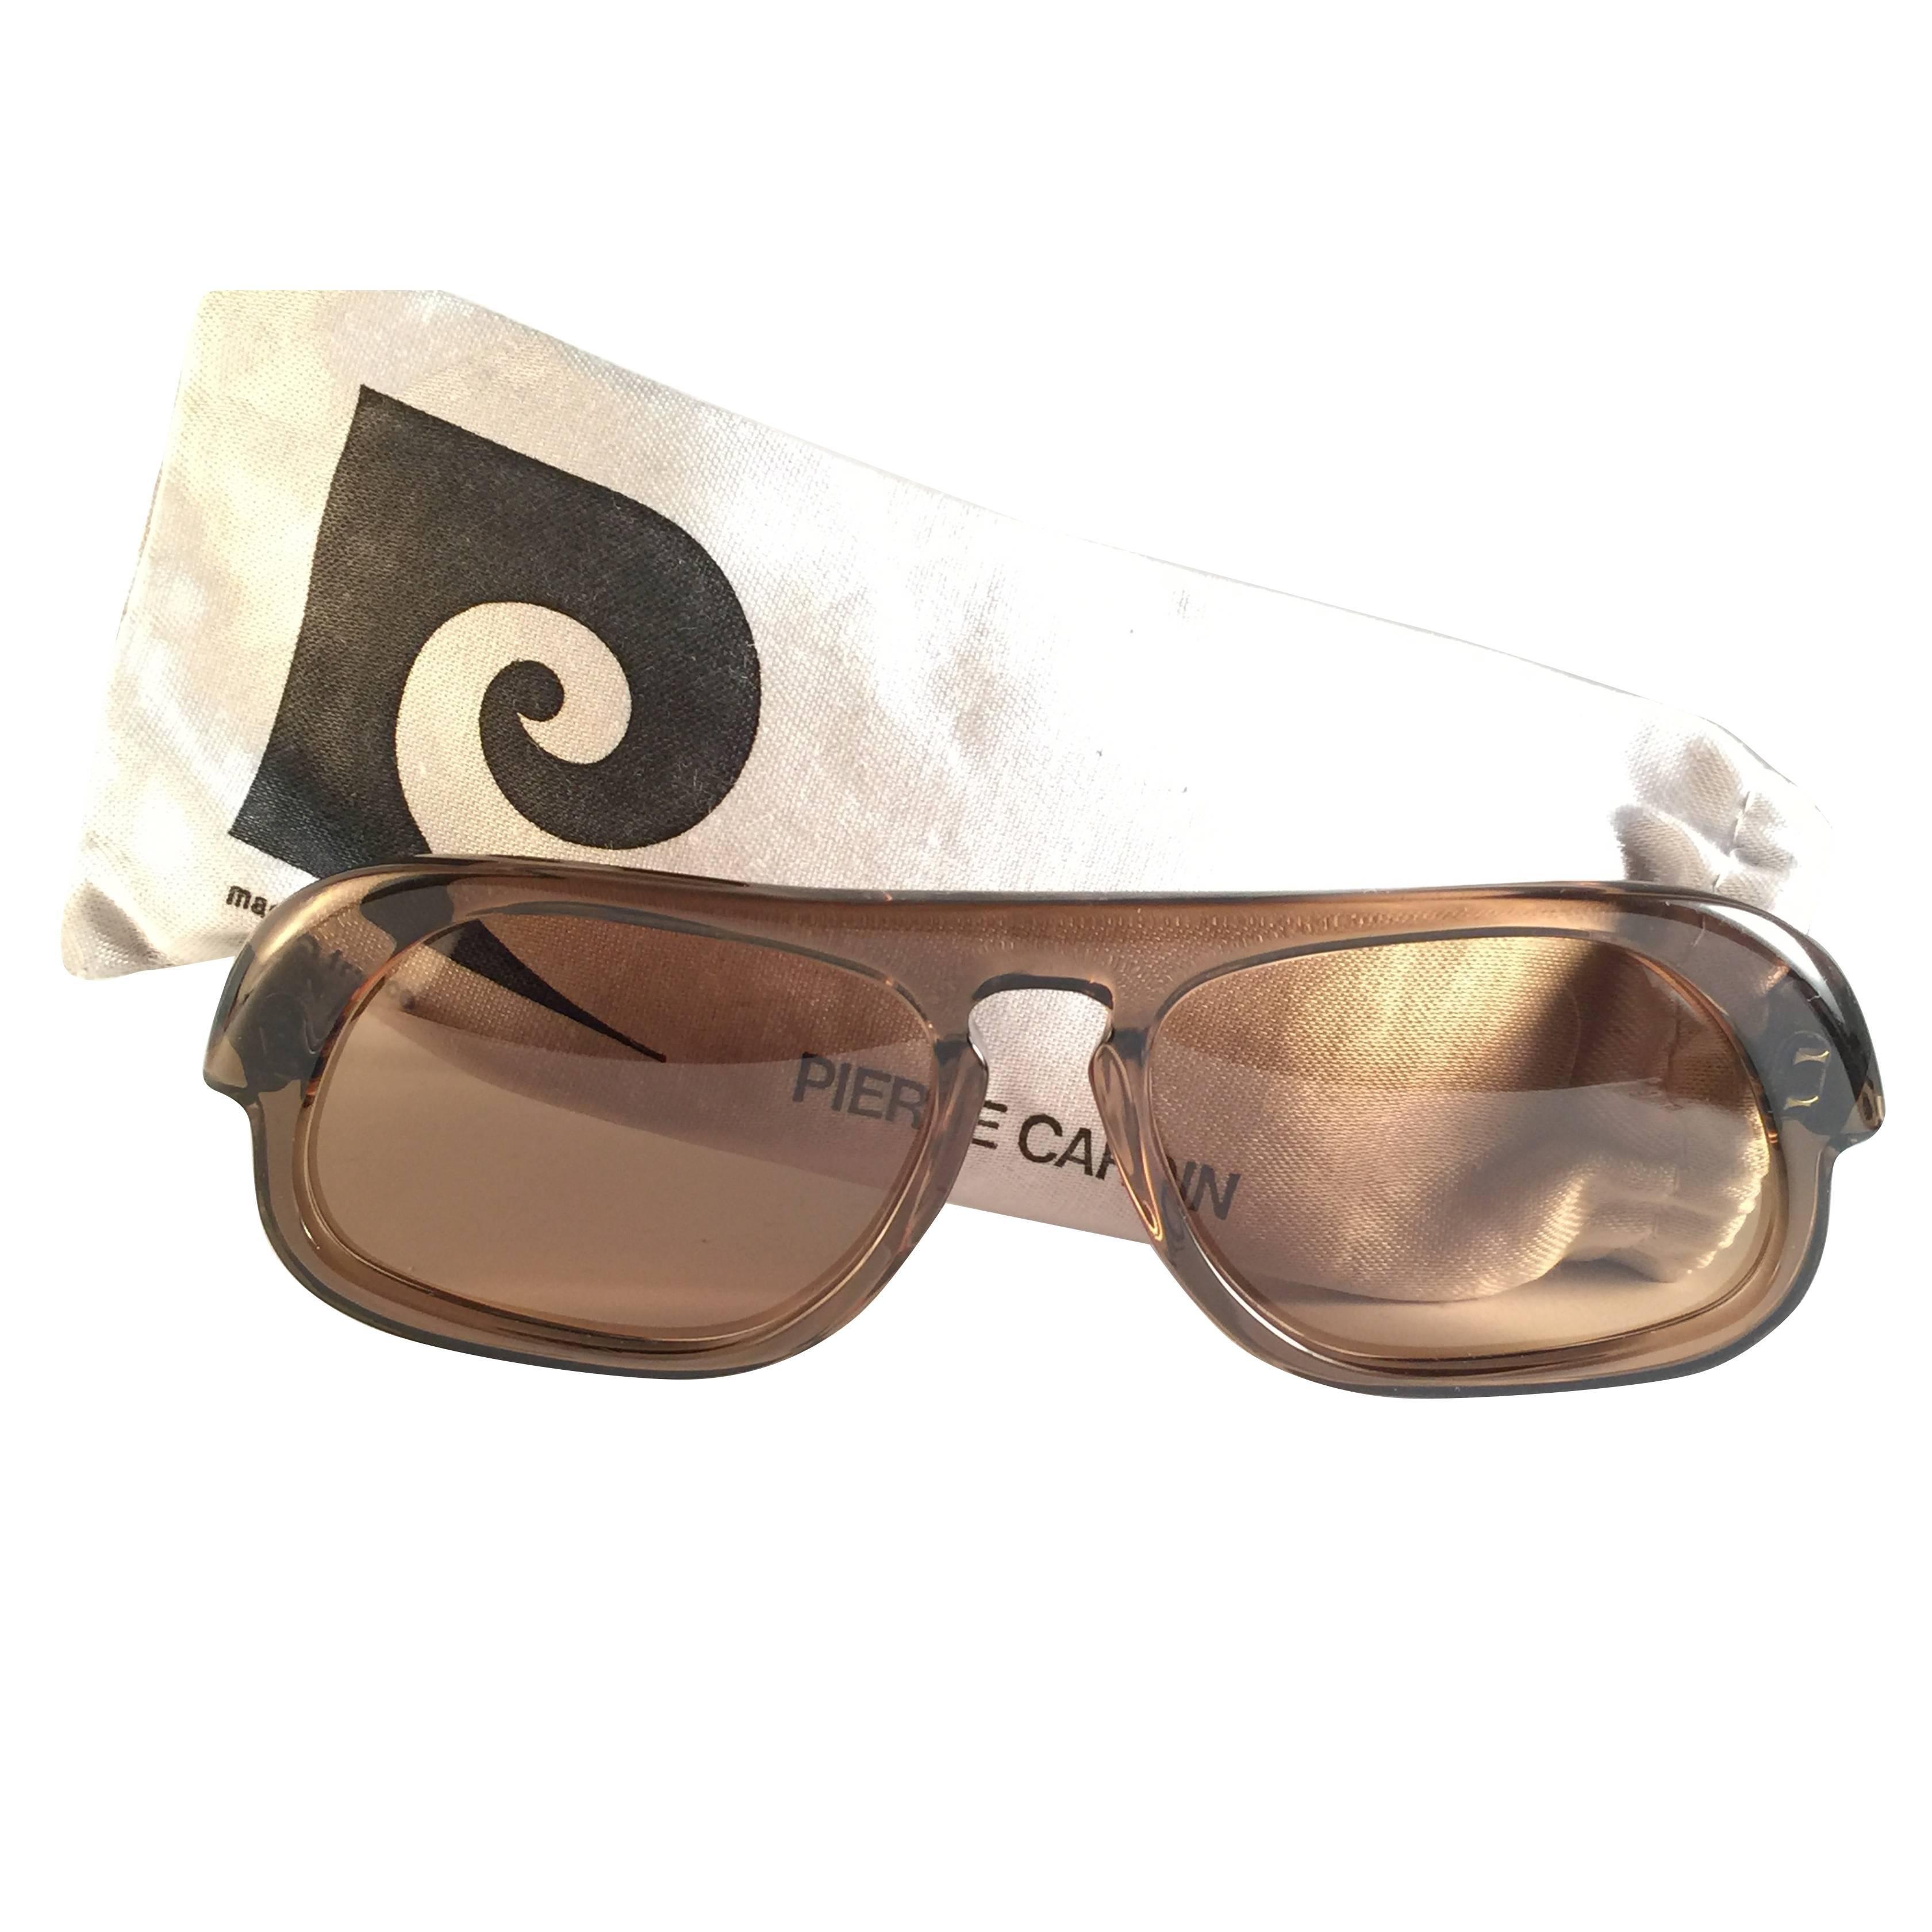 New Vintage Rare Pierre Cardin Brown Solid Lens 1960's sunglasses